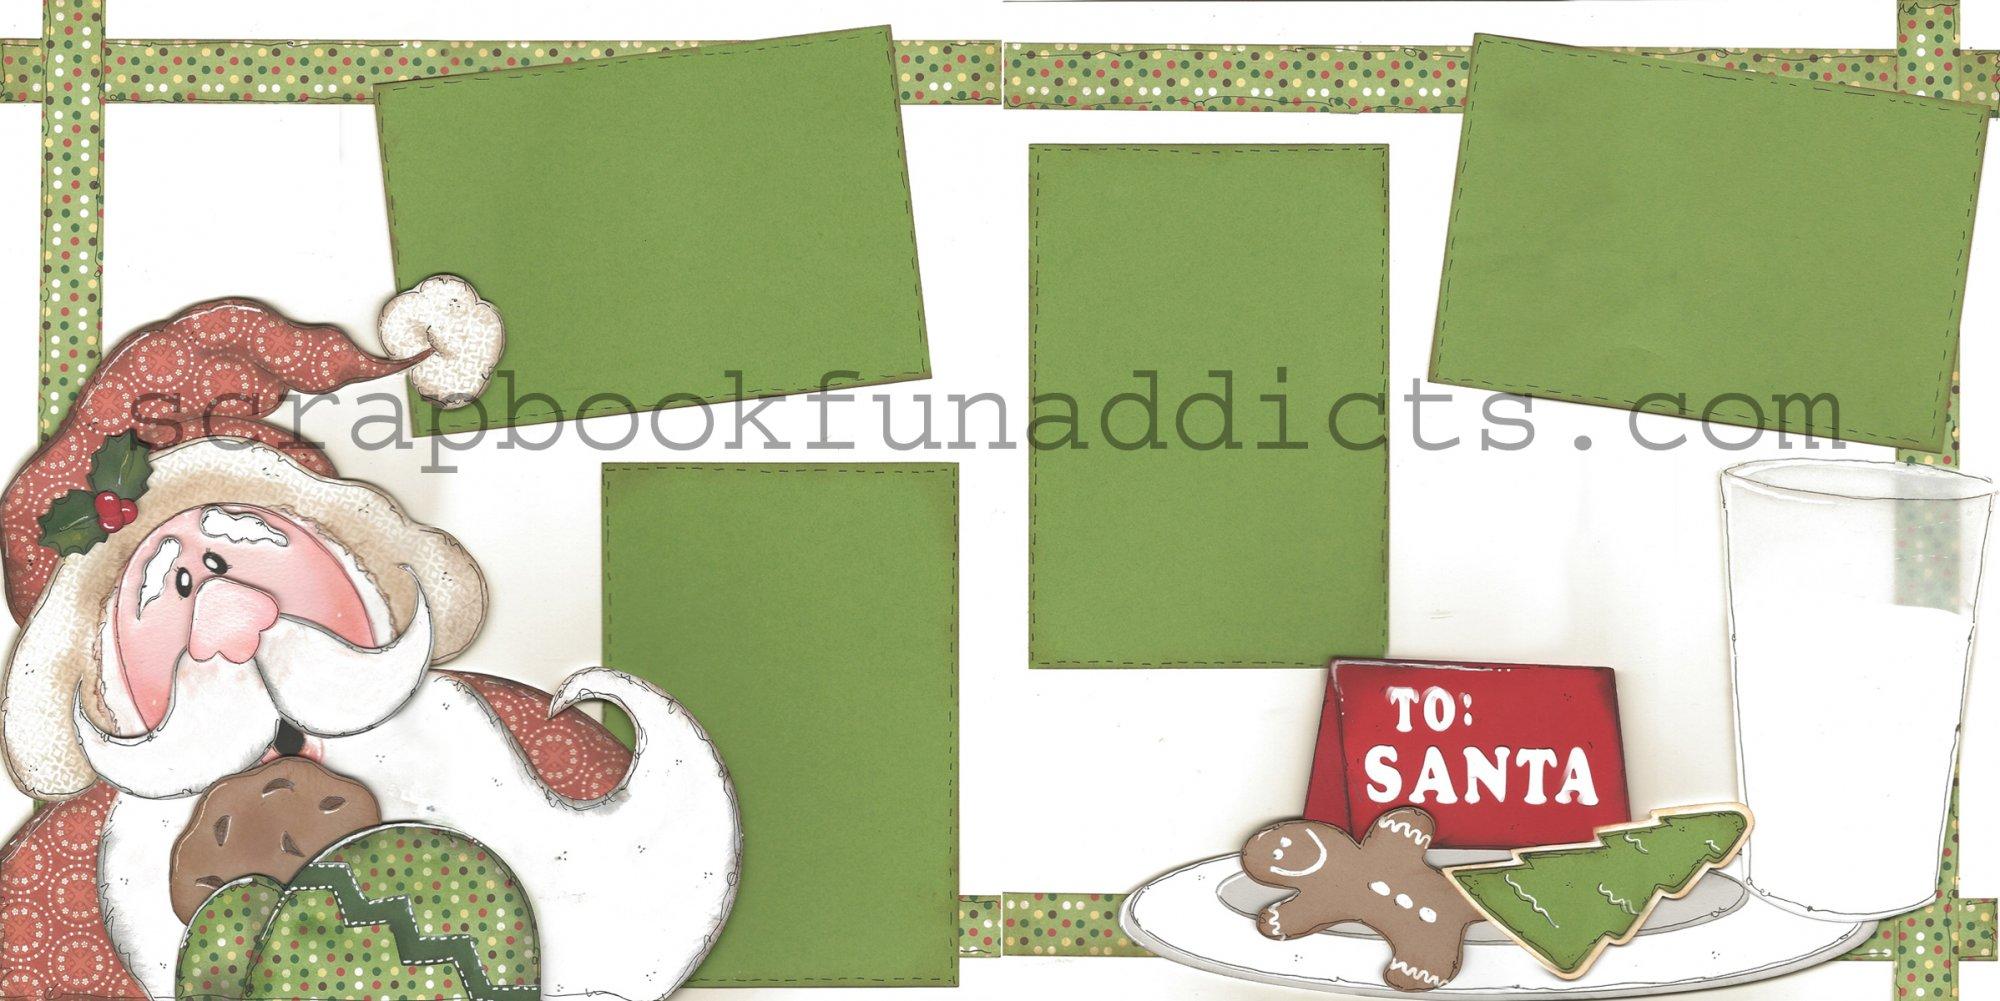 #362 Santa's Cookies